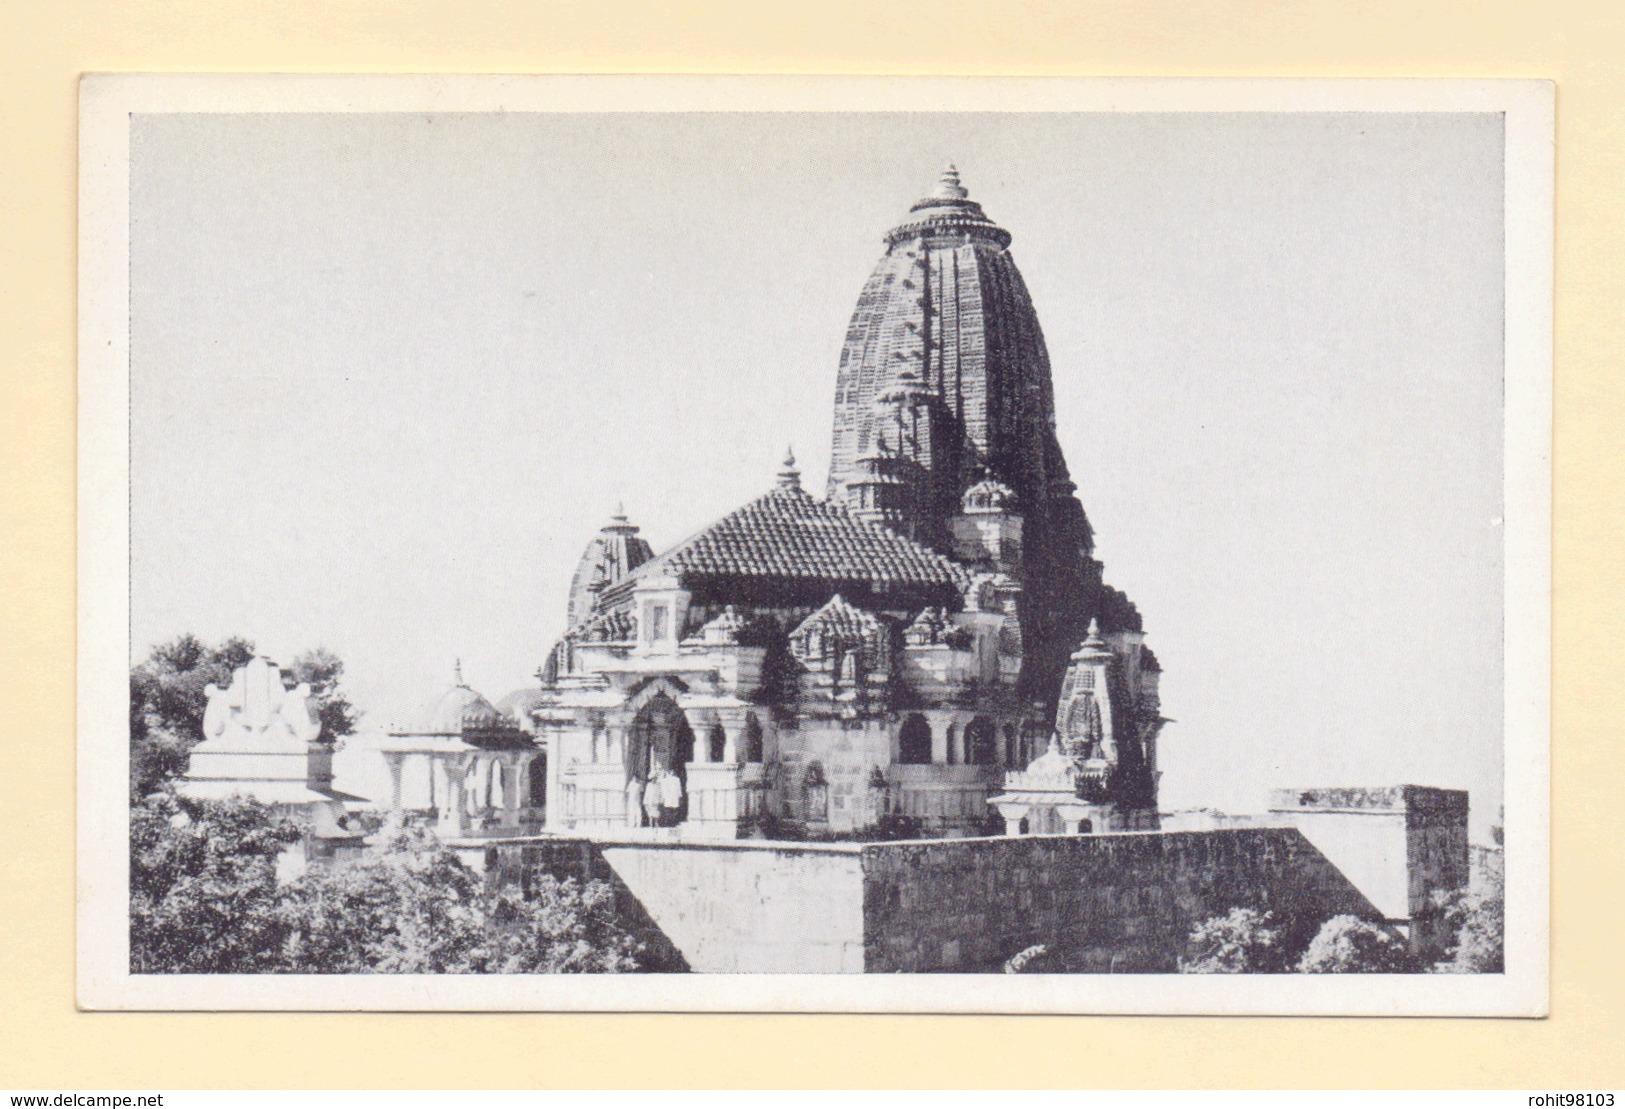 Kumbh Syamaji Temple In Chittorgarh Fort, Chittor, Rajasthan India, The Seat Of Rana Ratan Singh Of Mewar, Lot # IND 706 - India